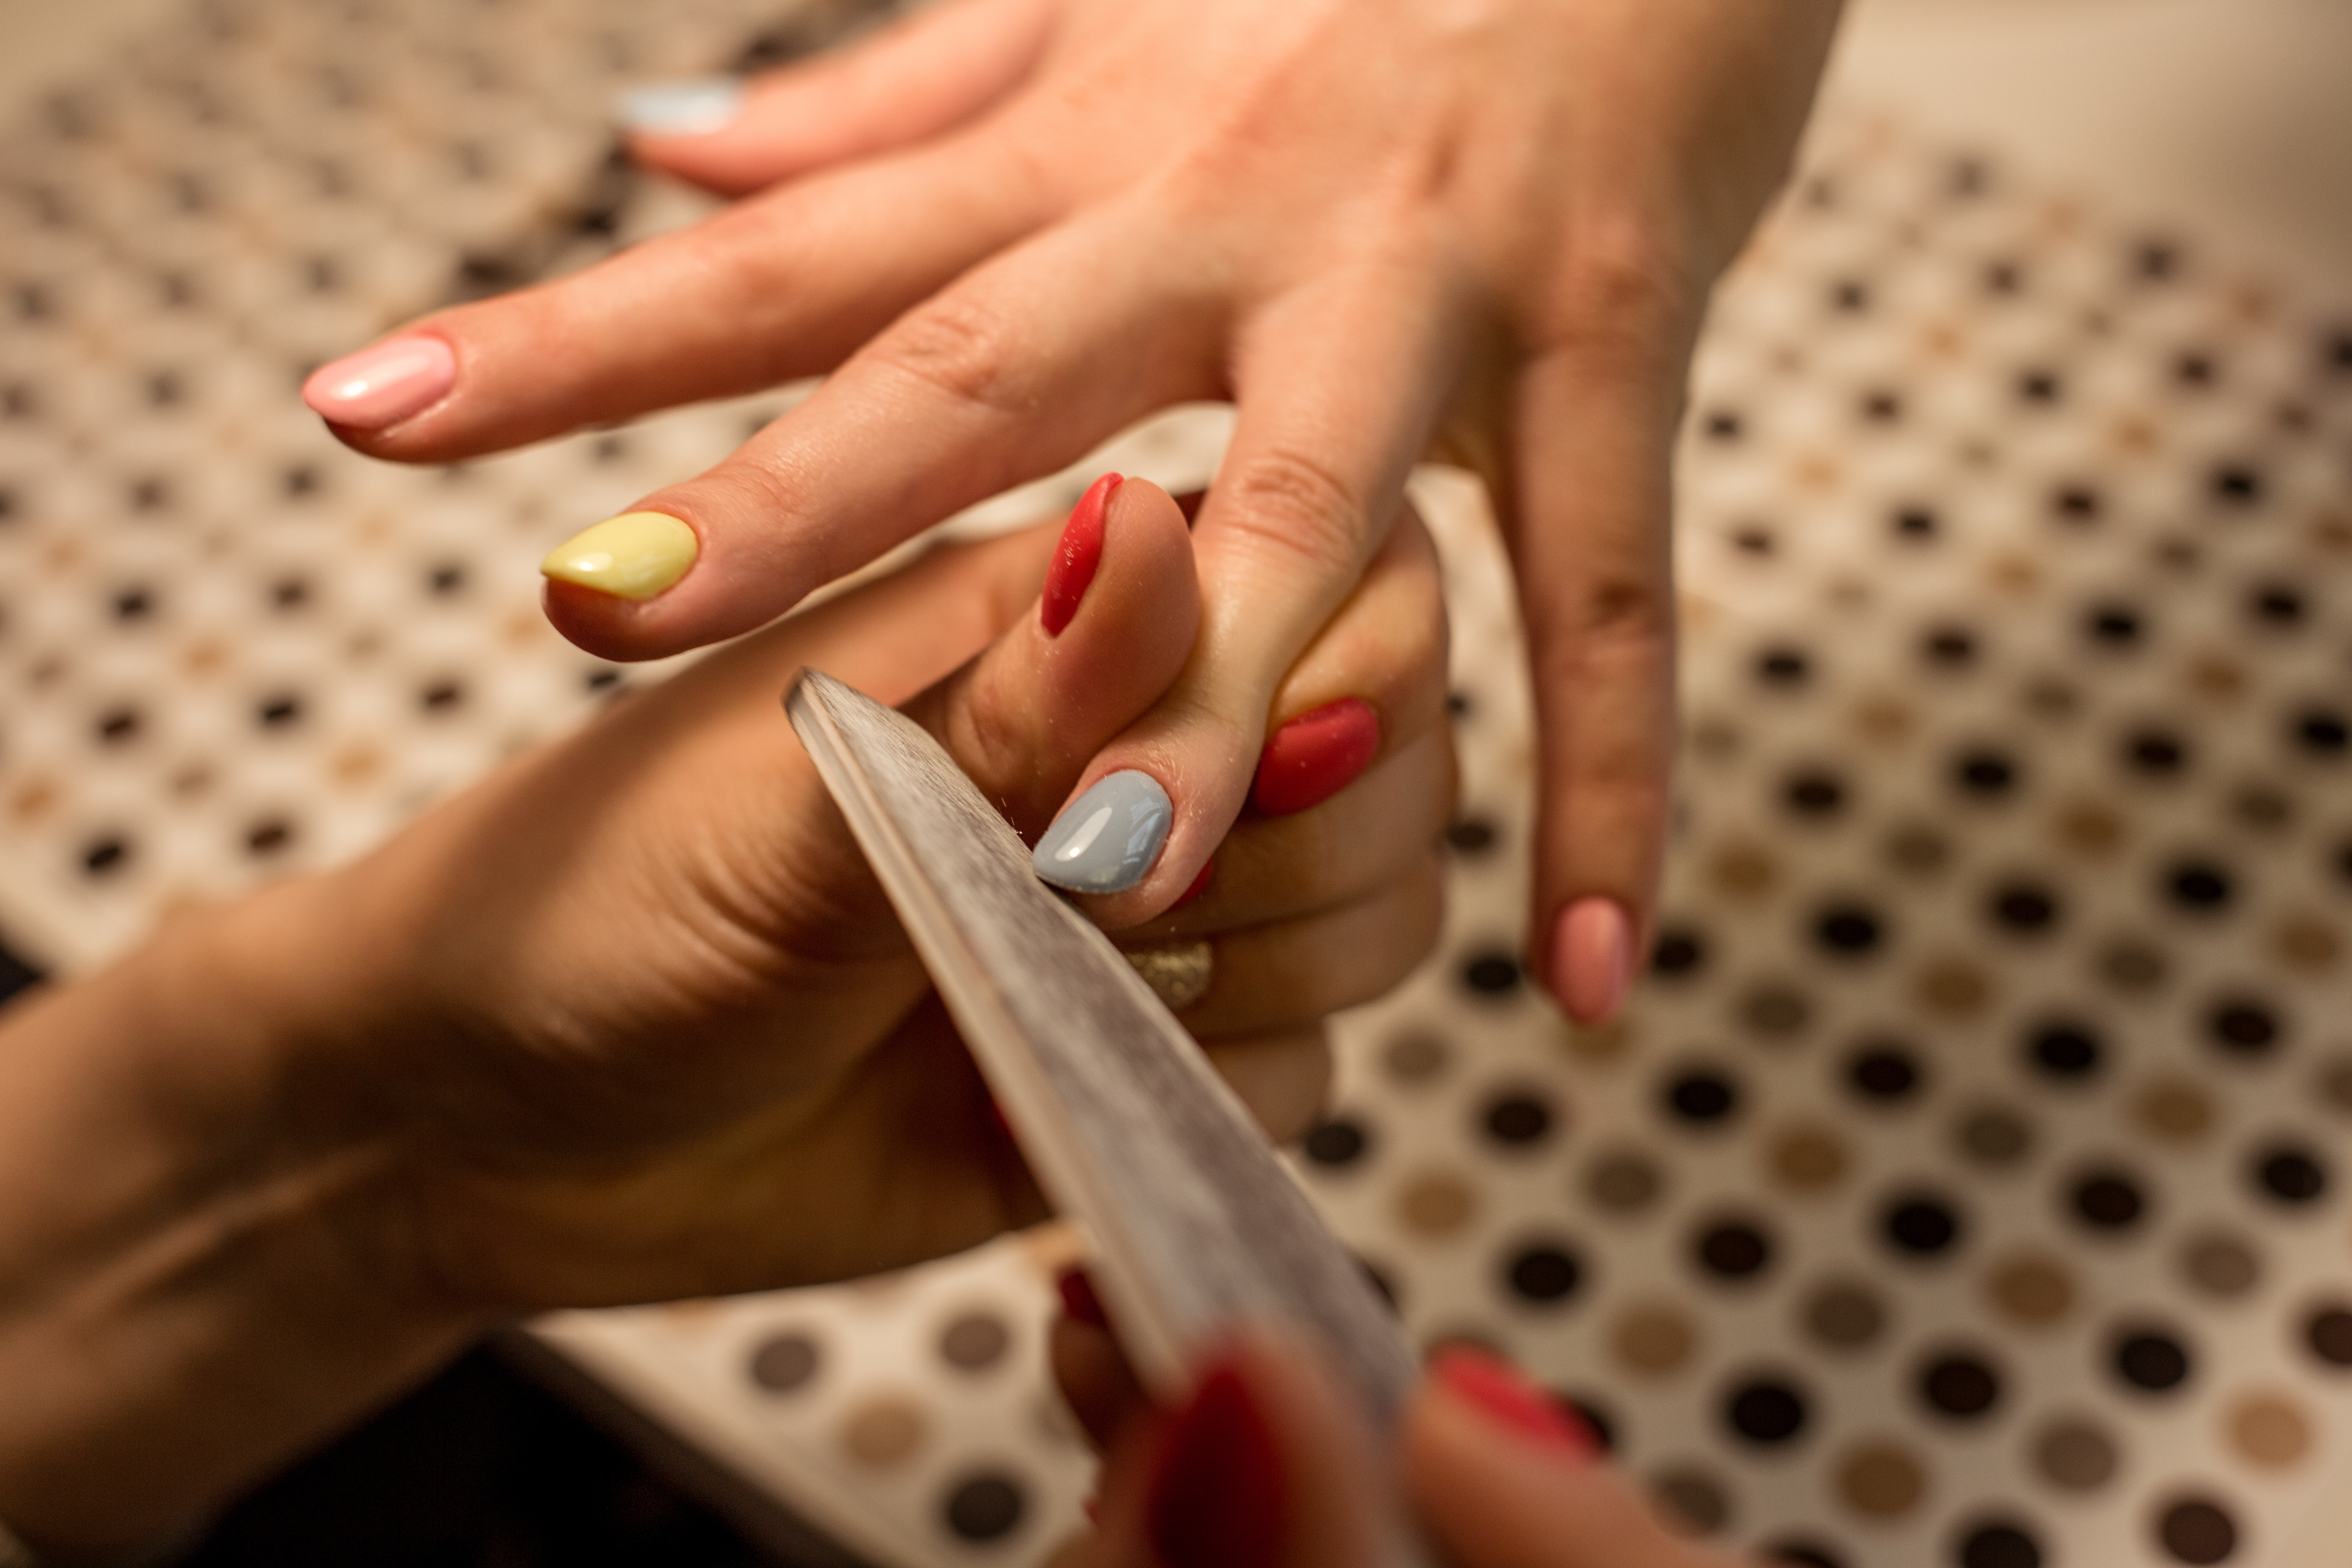 Classic Manicure + Pedicure + Foot Scrub for 1 Person (2 Sessions)